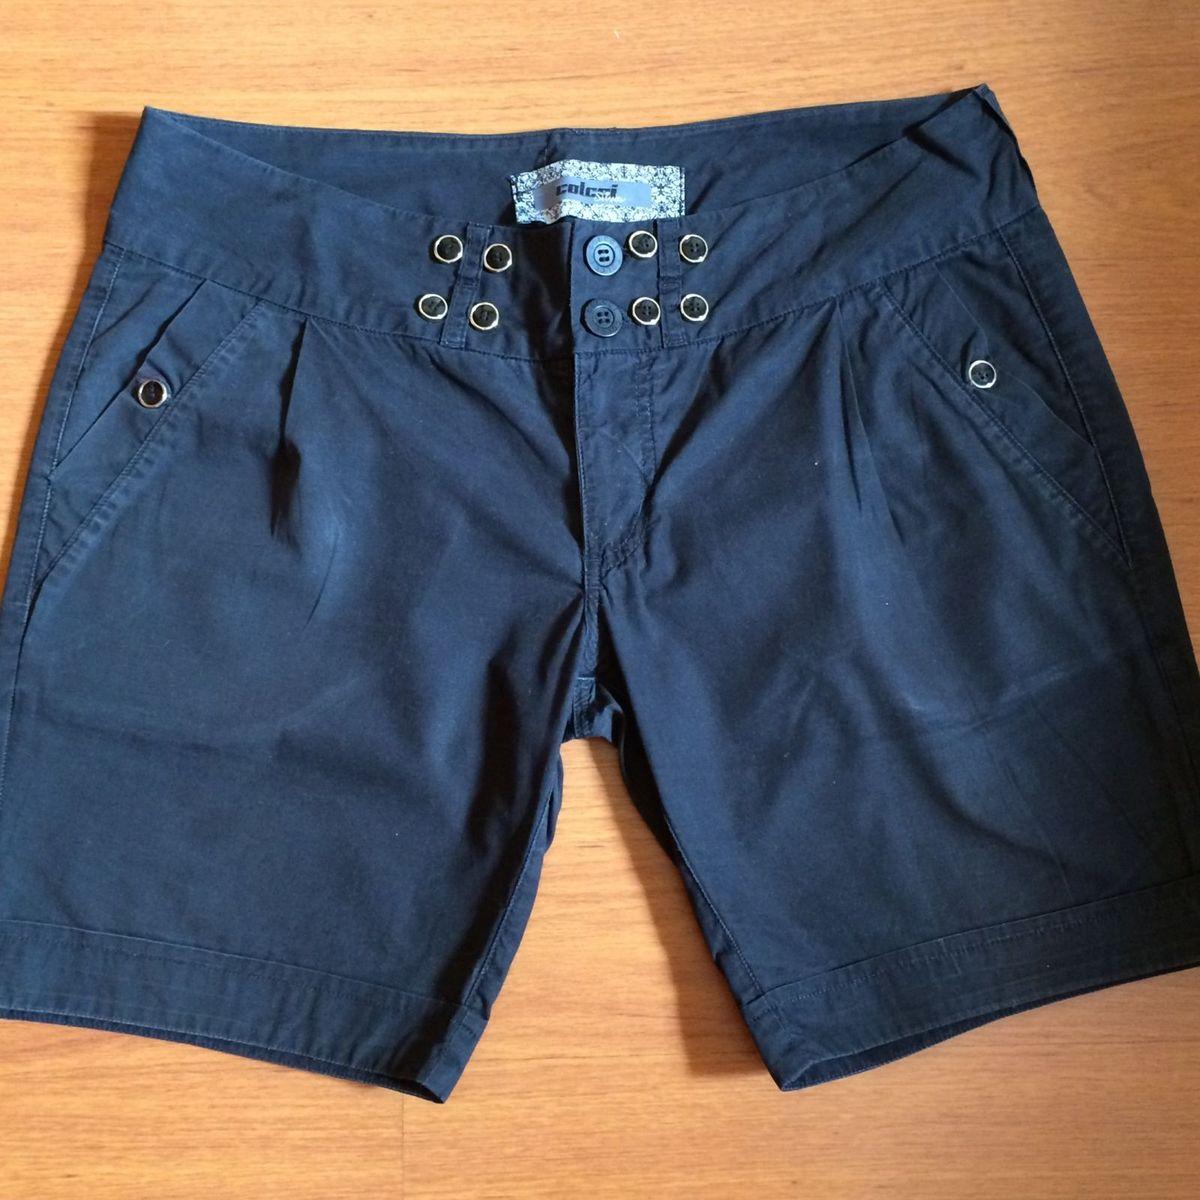 19983d785 Short Preto Colcci | Shorts Feminino Colcci Usado 20174092 | enjoei